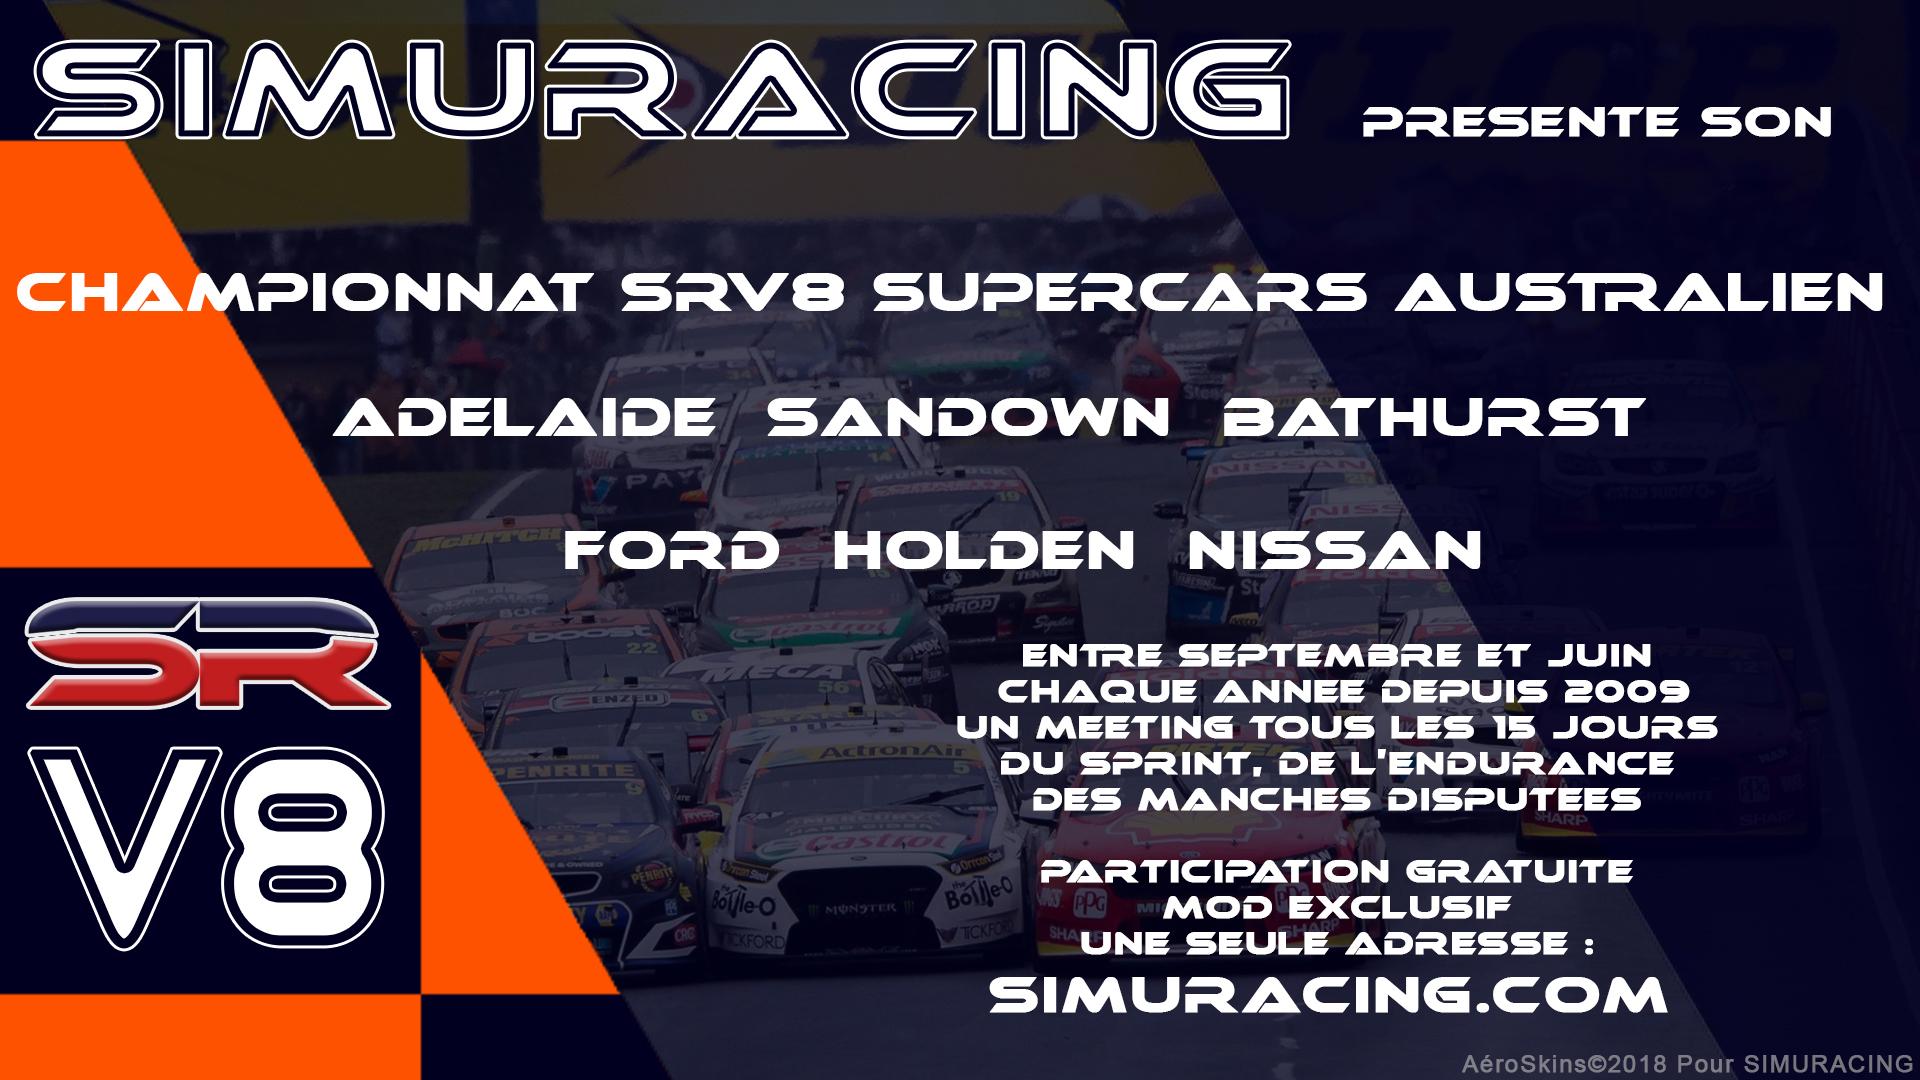 Championnat V8 SuperCars chez Simuracing